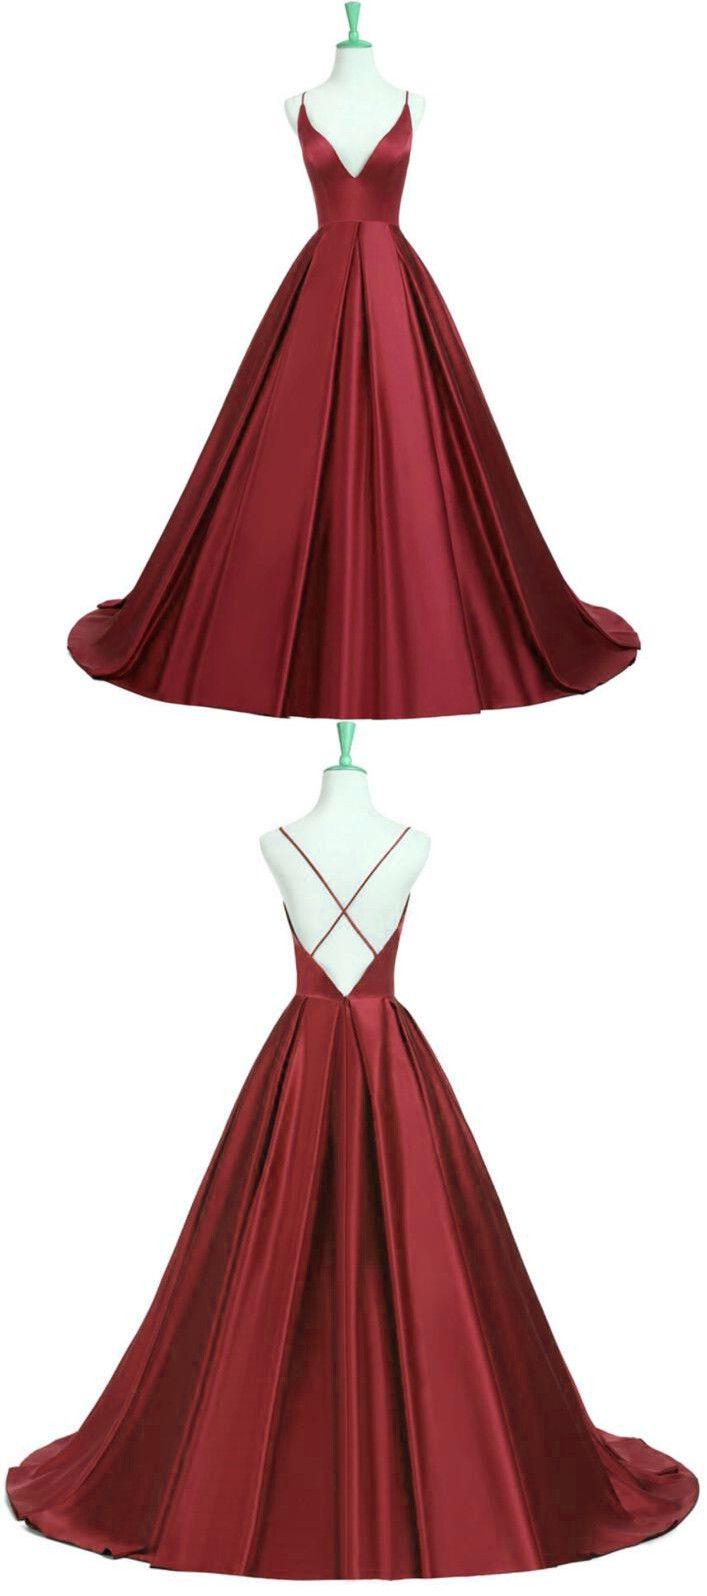 Elegant Spaghetti Straps Prom Dresses,Long Prom Dresses,Cheap Prom Dresses, Evening Dress Prom Gowns, Formal Women Dress,Prom Dress